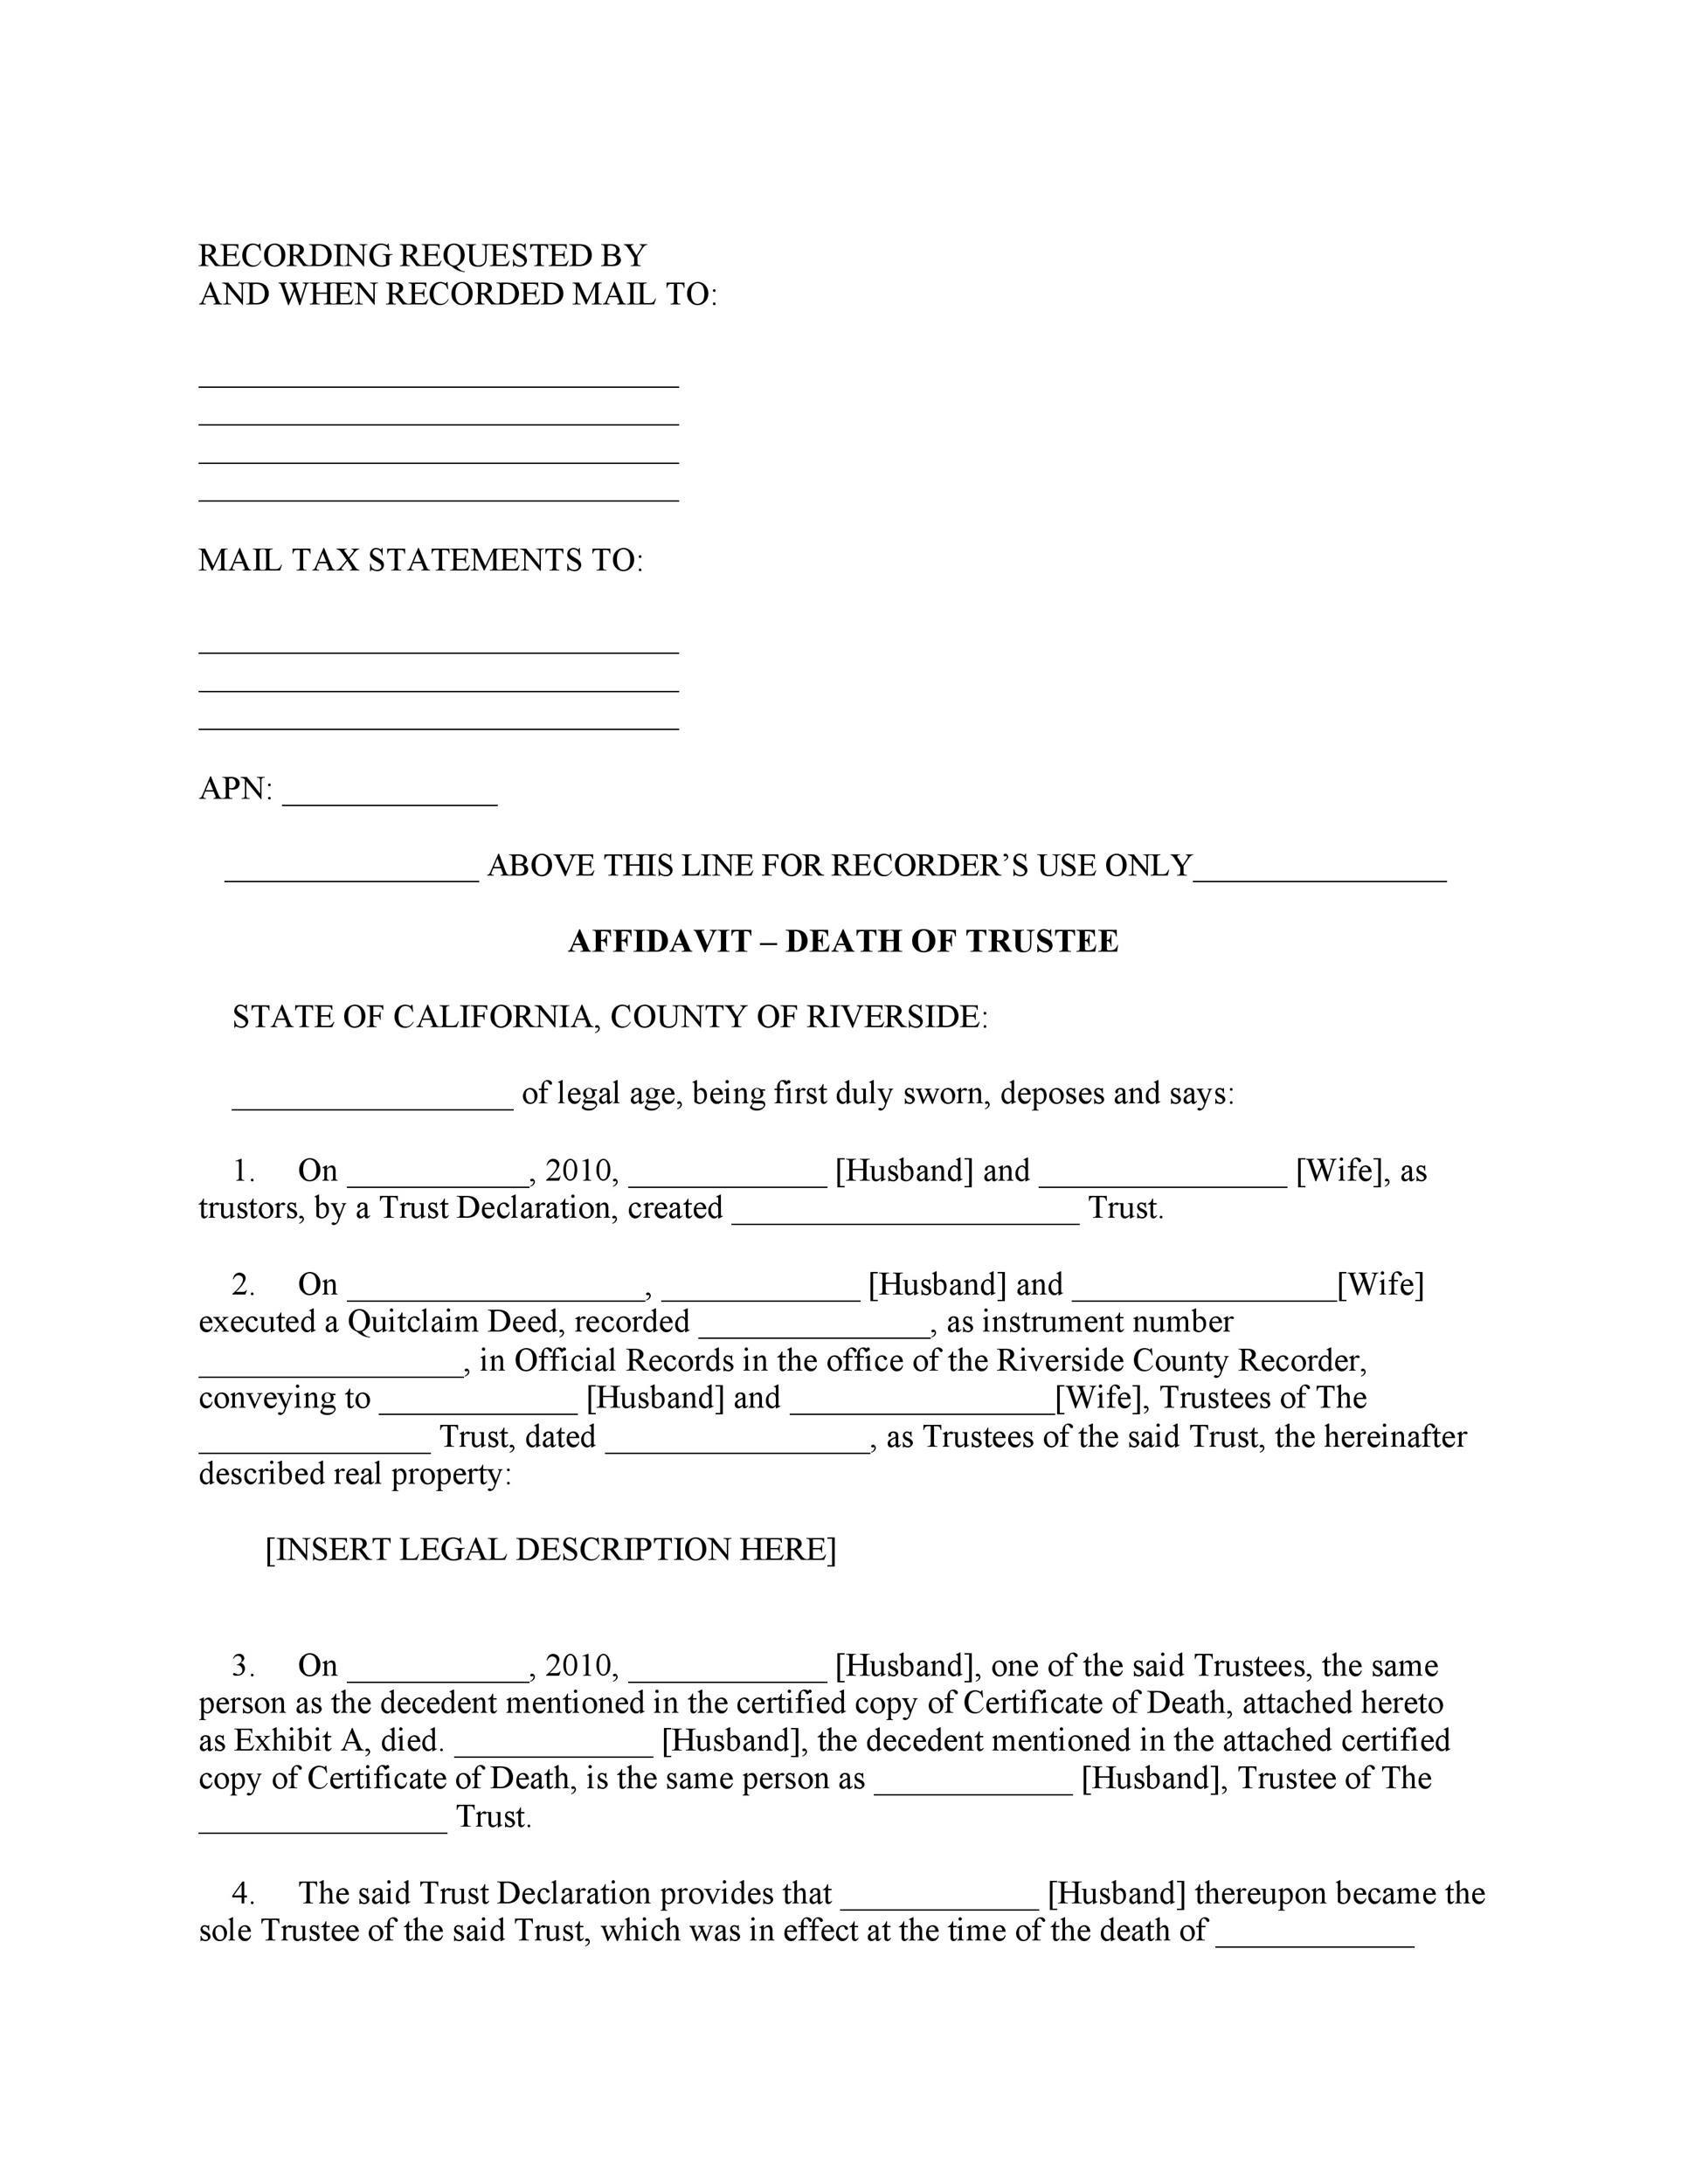 Free affidavit of death 23